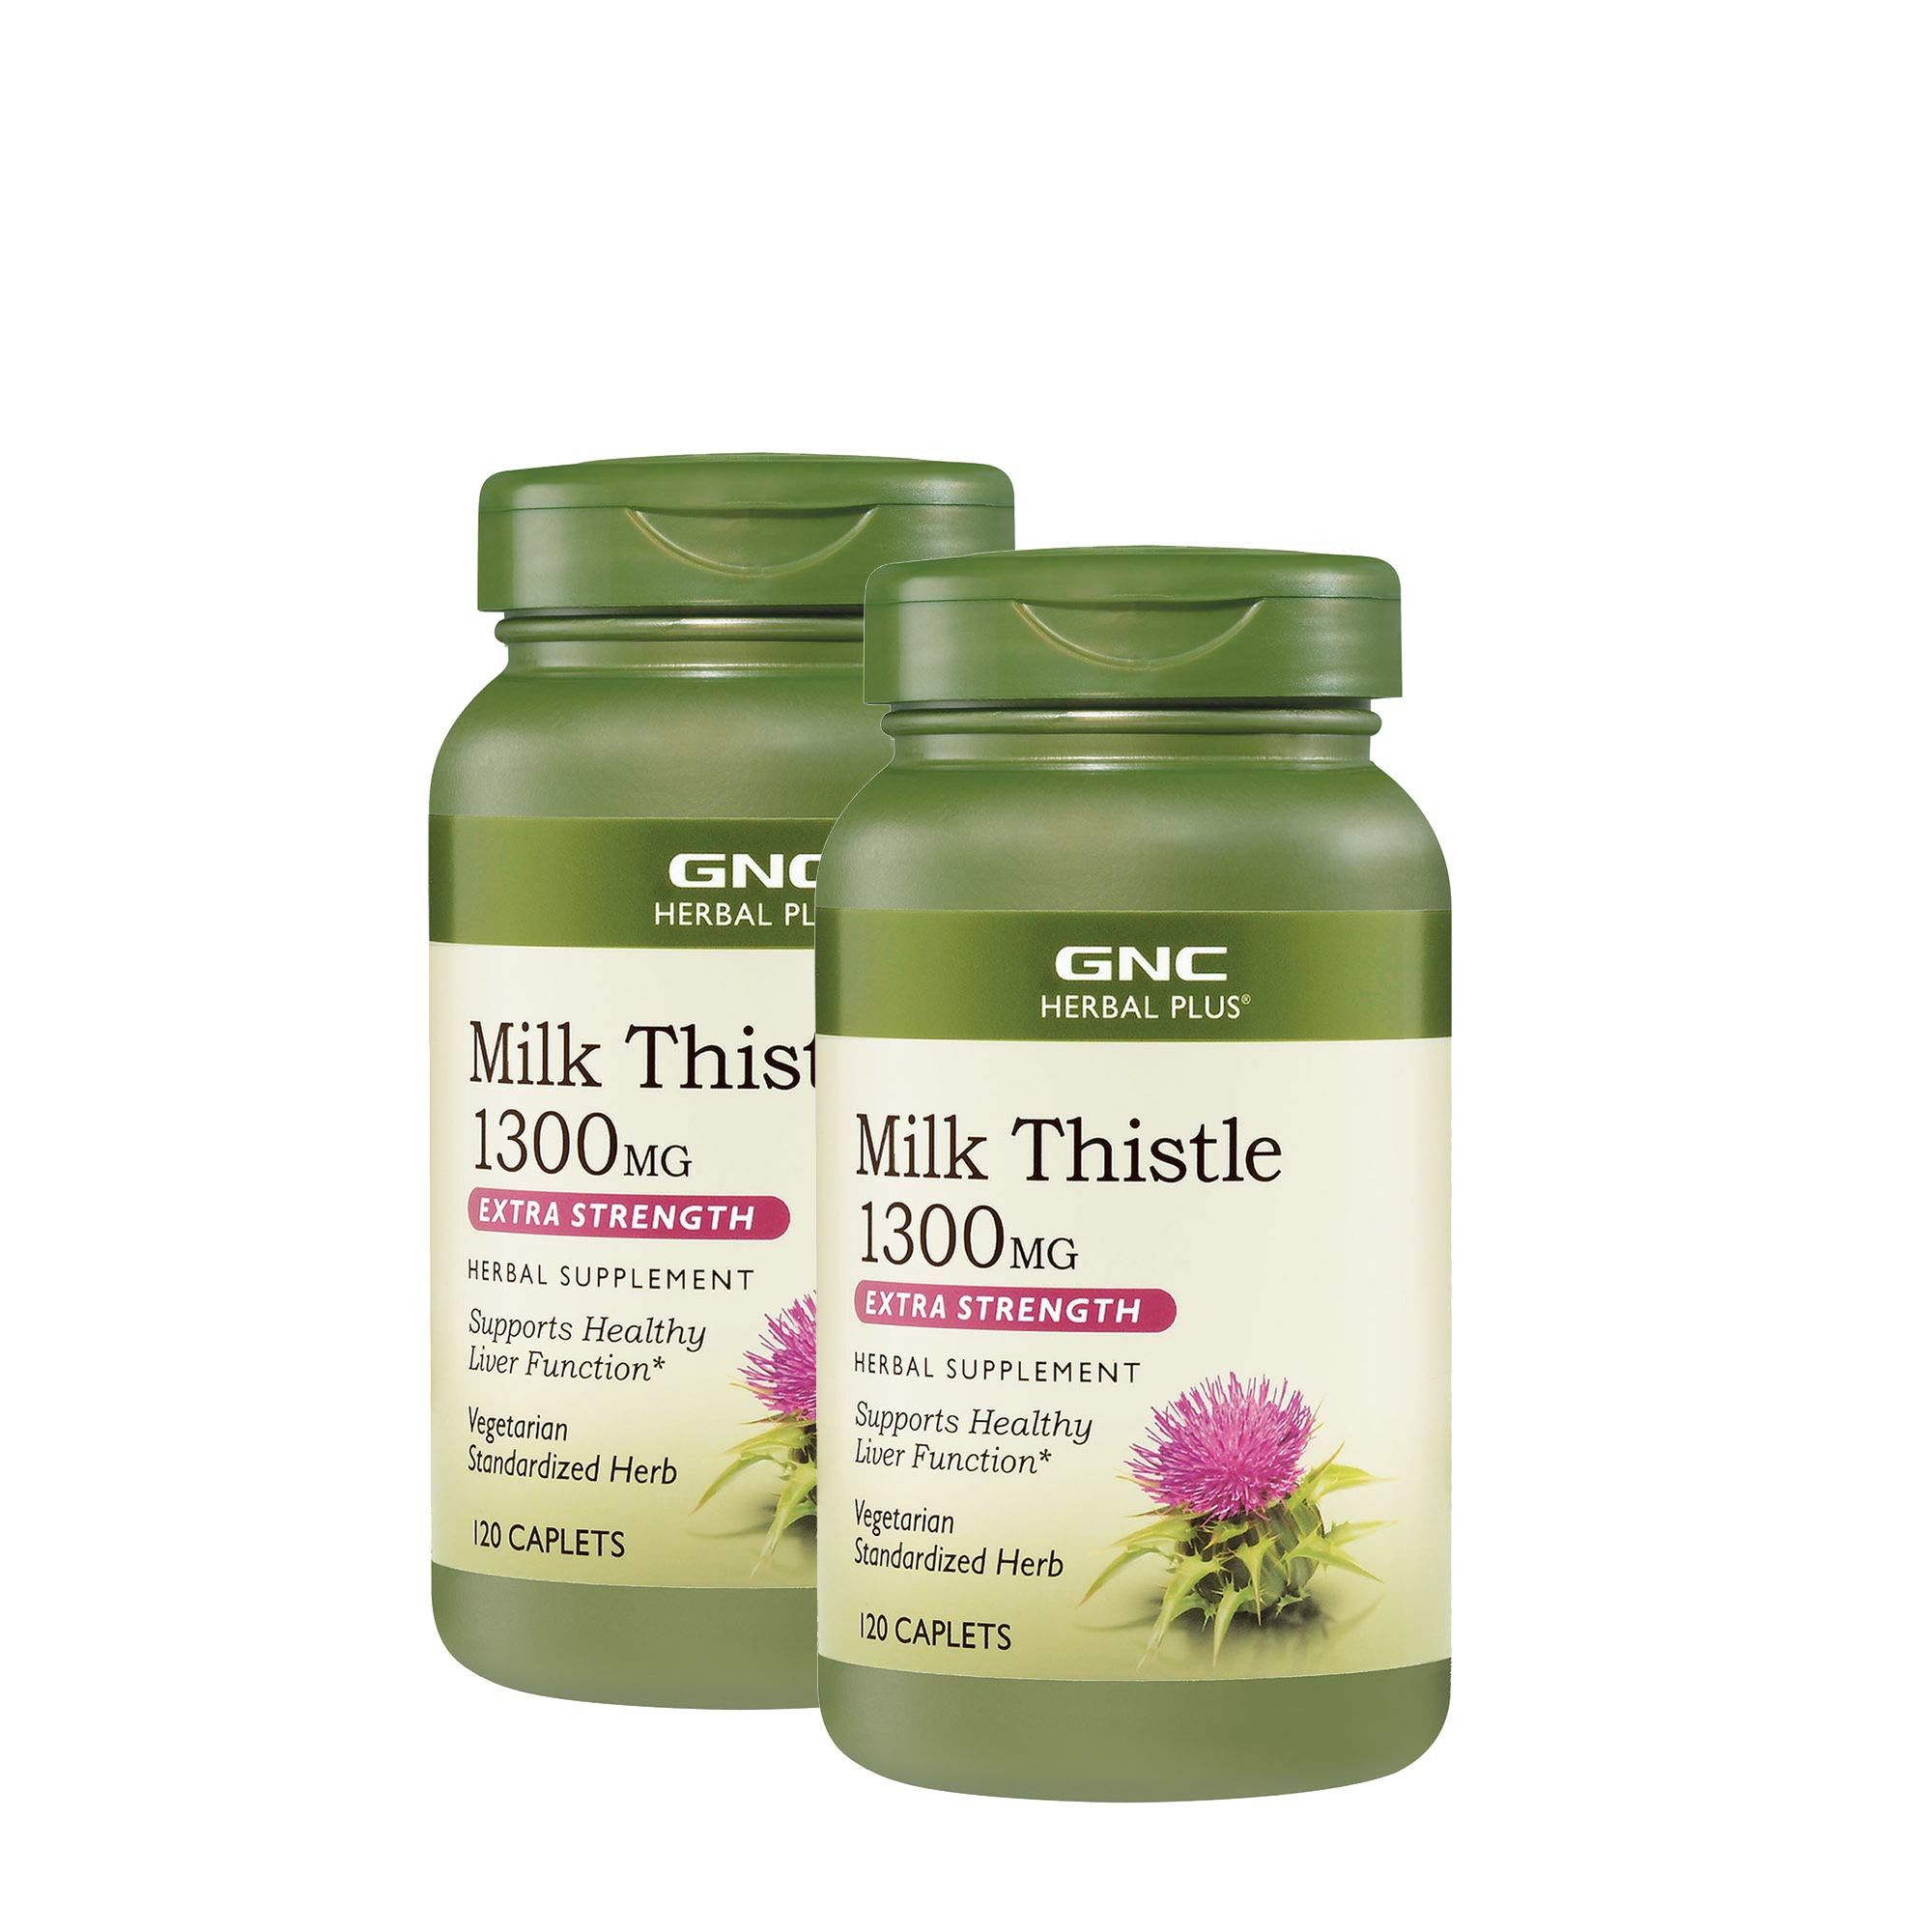 GNC Herbal Plus Milk Thistle 1300mg - Twin Pack